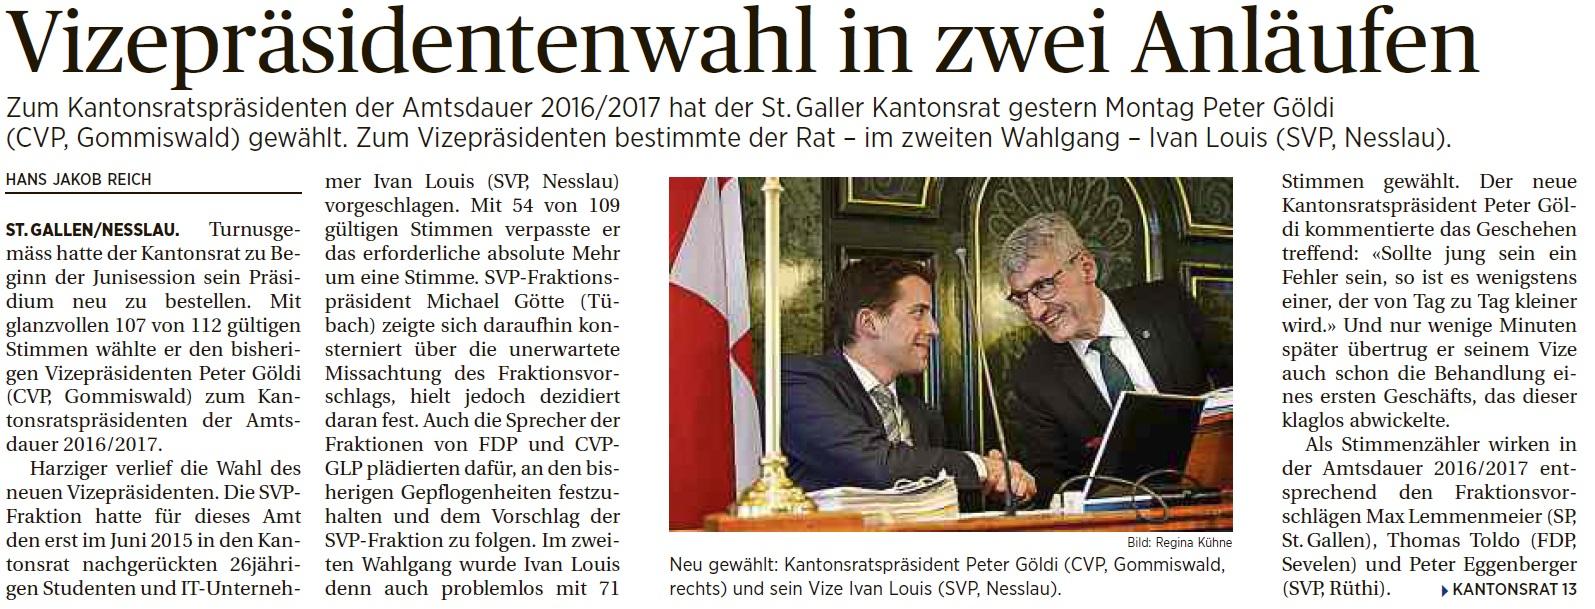 Wahl zum Kantonsratsvizepräsidenten (Montag, 06.06.2016)